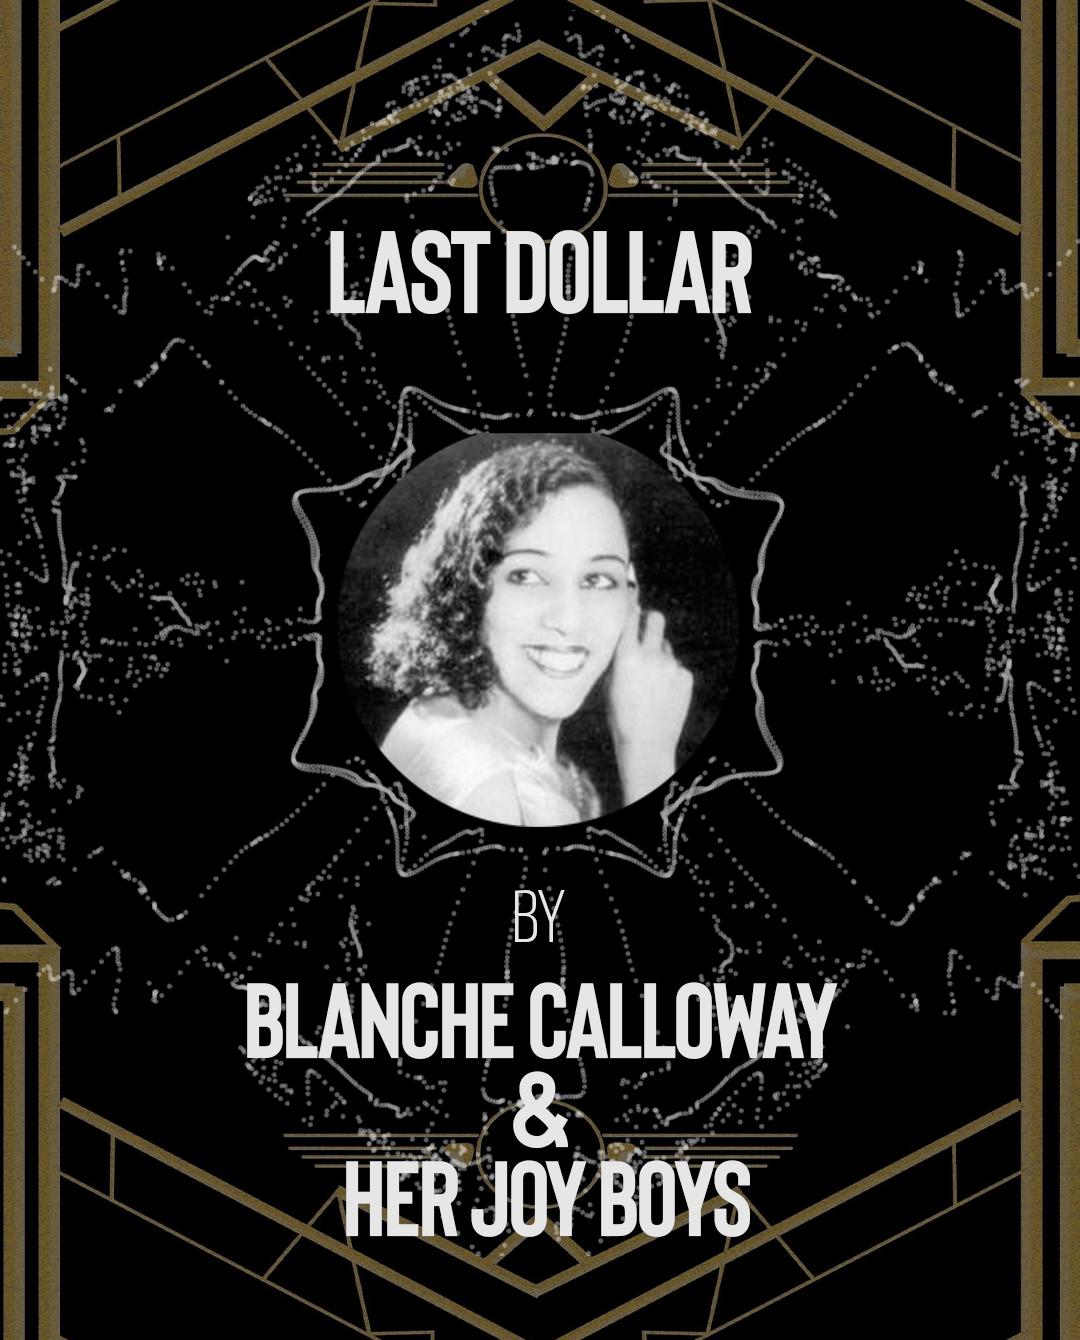 Blanche Calloway